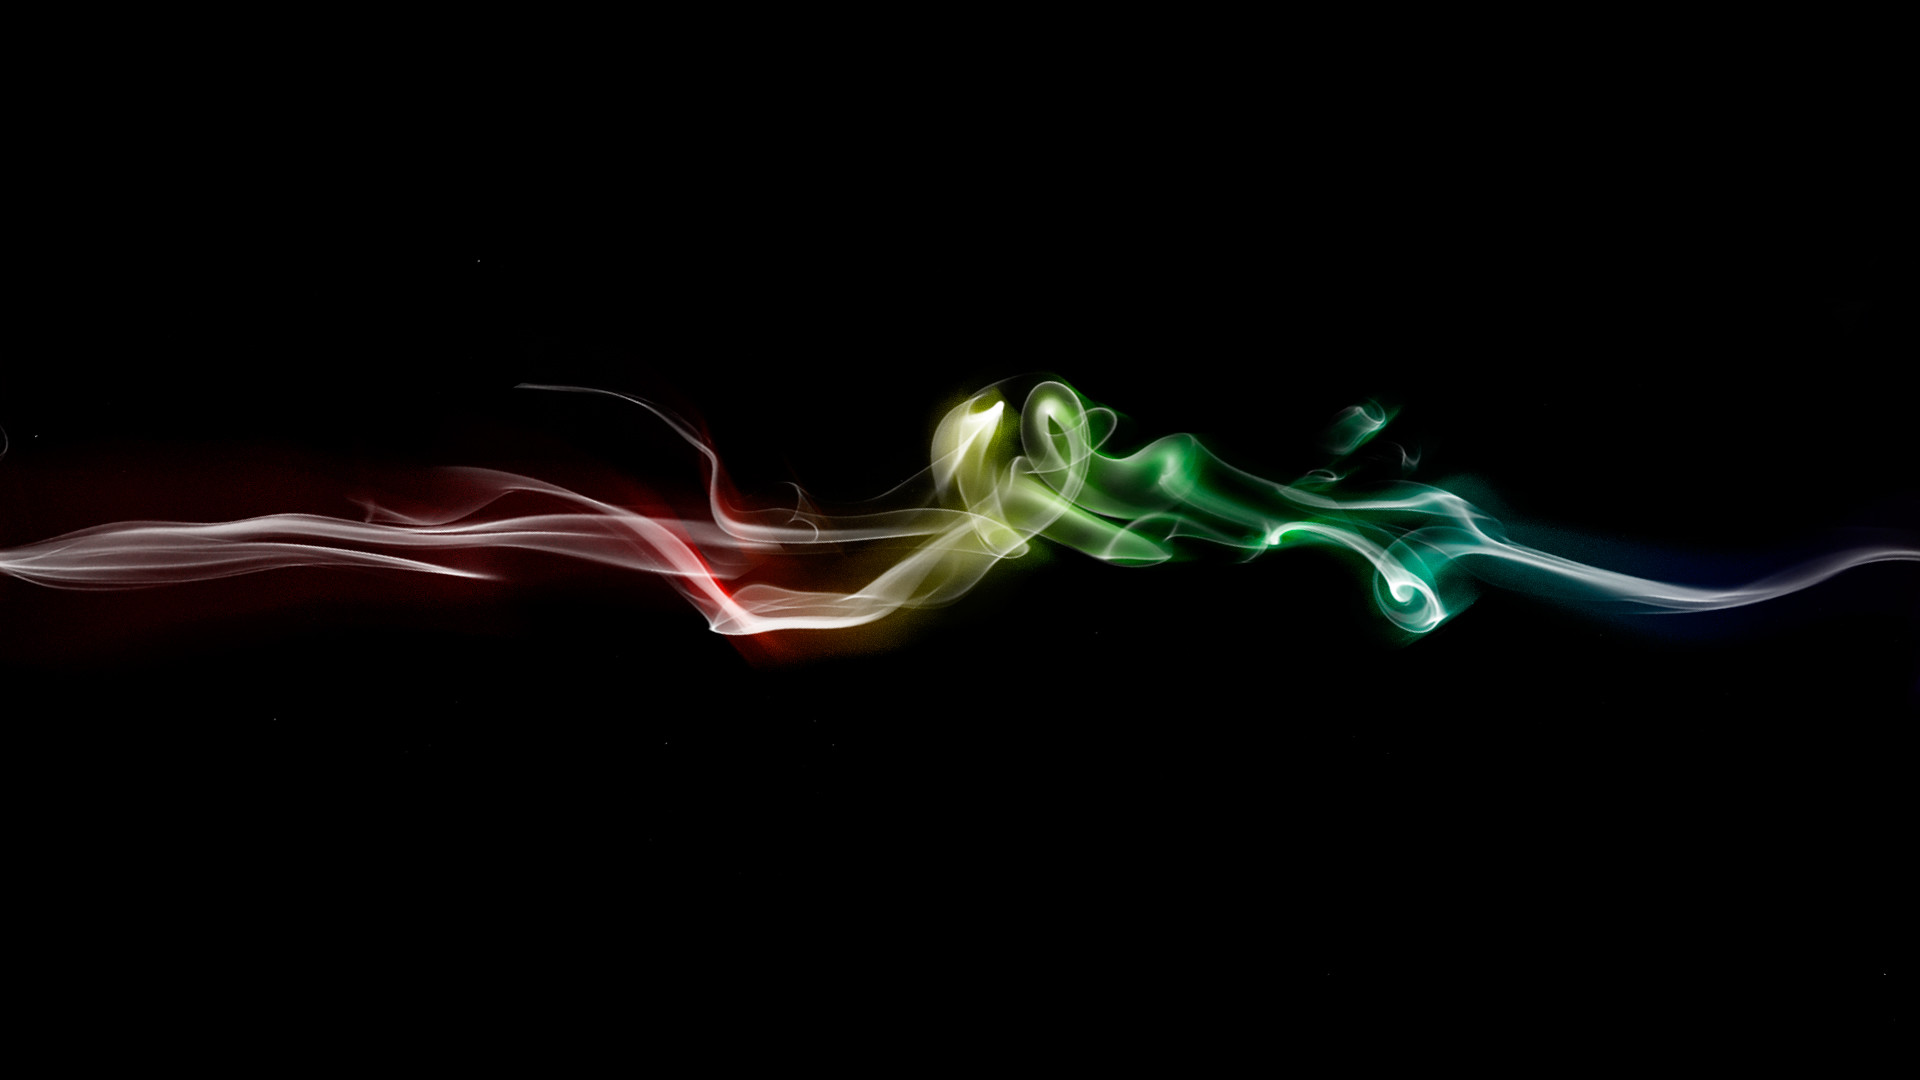 hd neon smoke gif wallpapers – Google Search